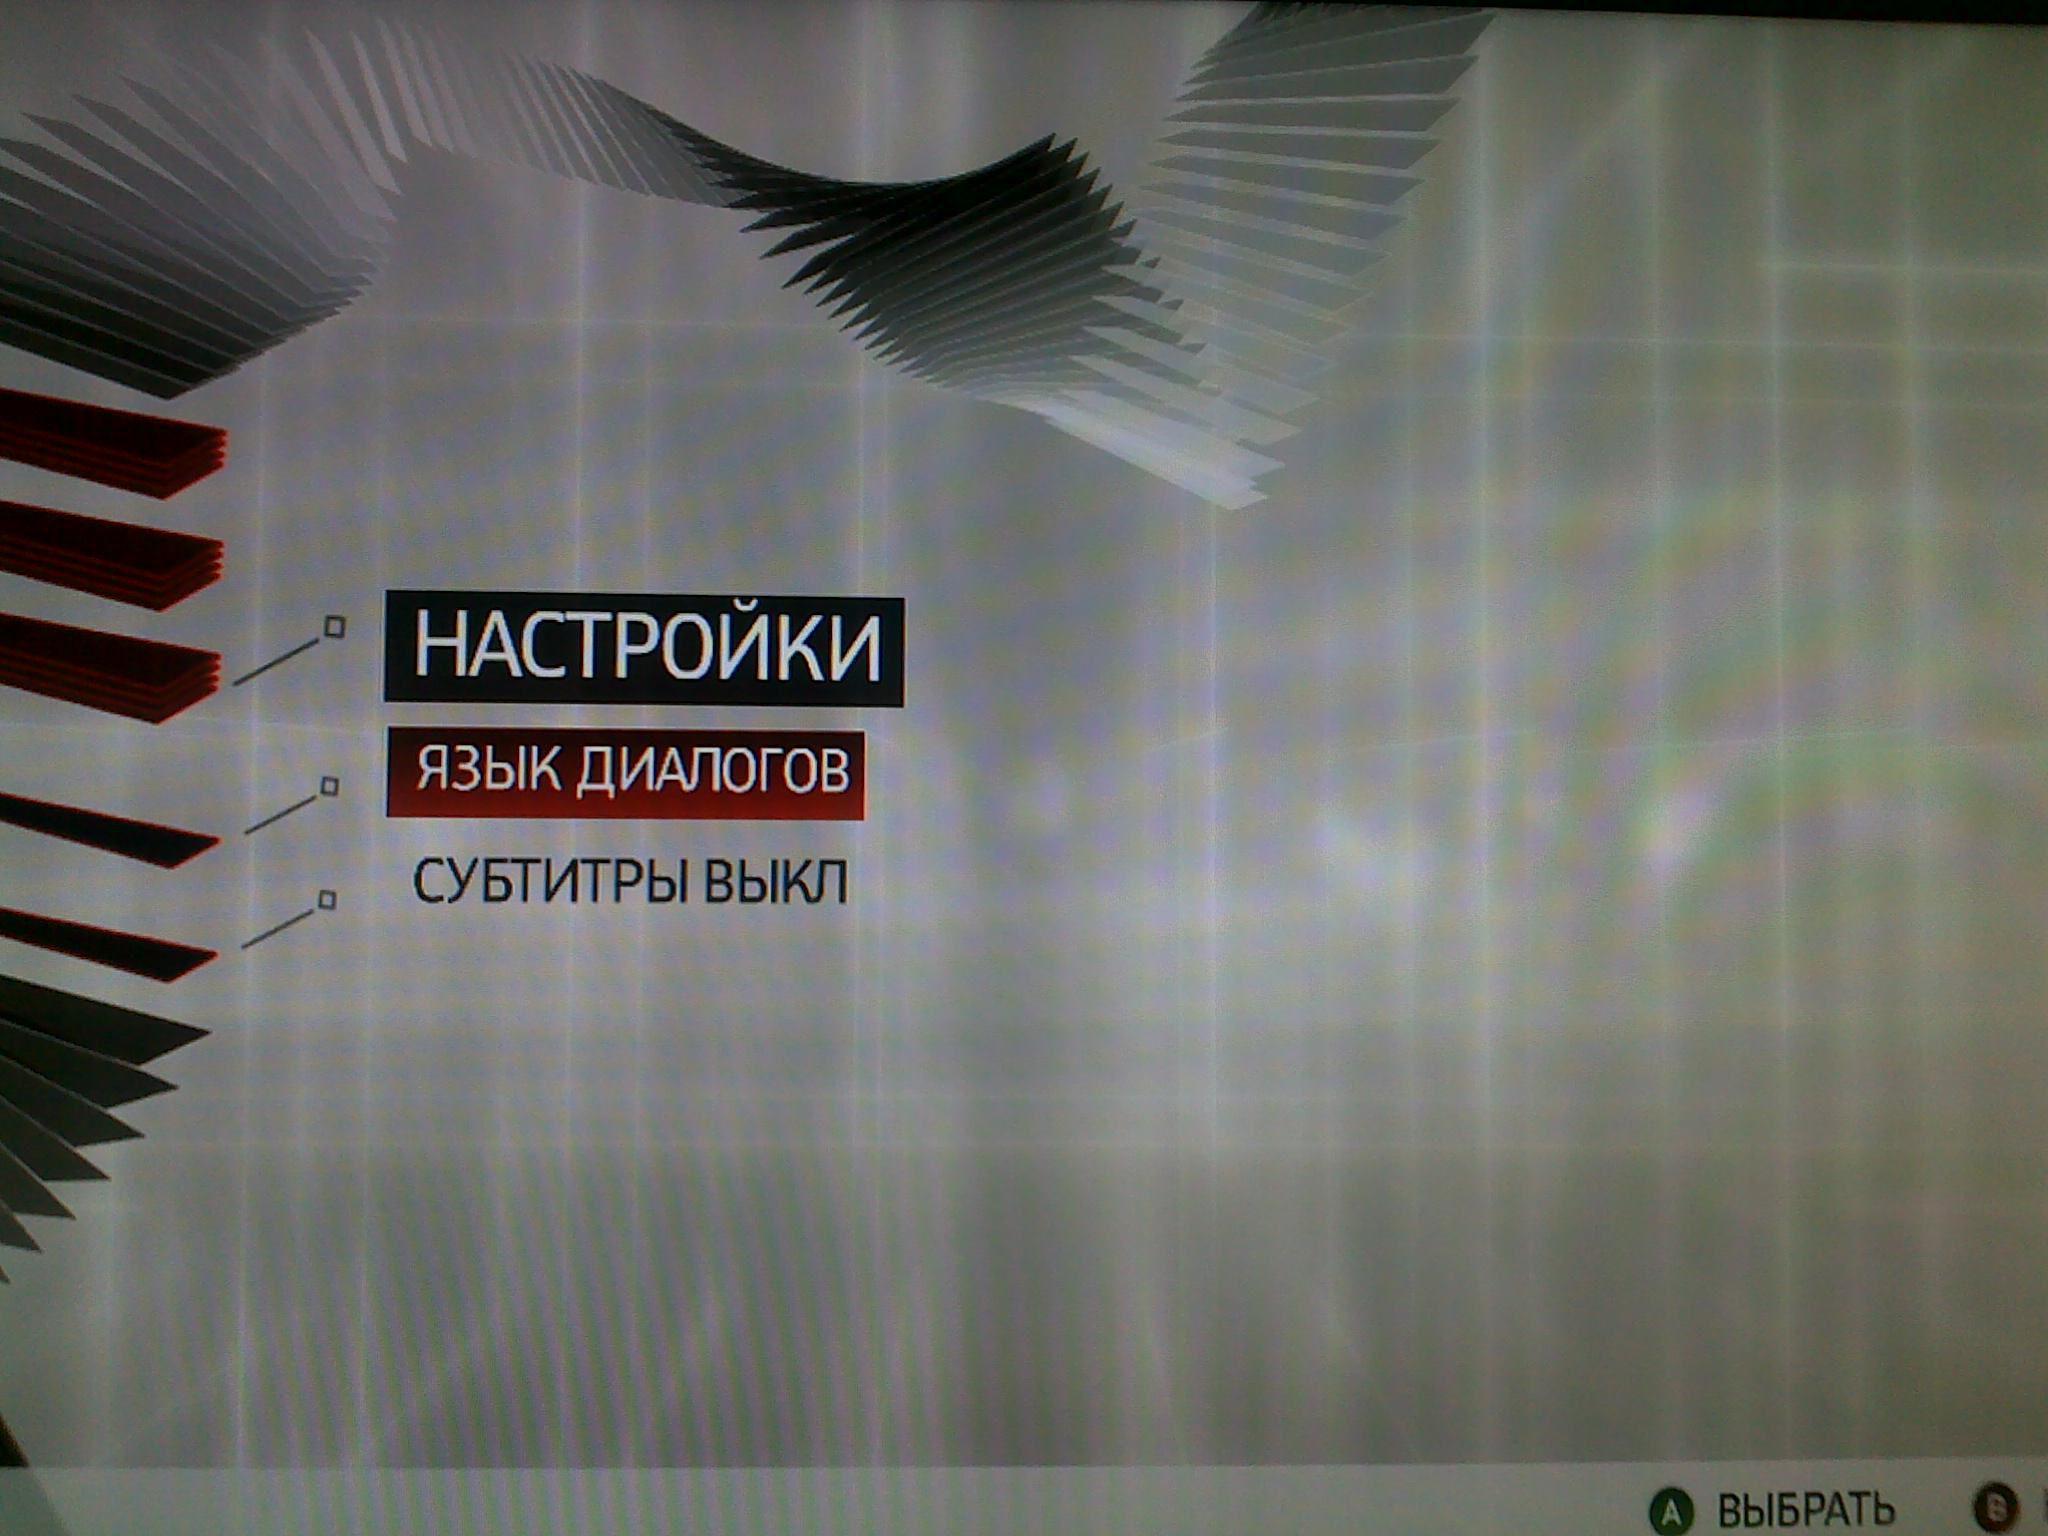 http://imageban.ru/out/2009/12/06/a47aafb23b28598fa47a2755c2e4b720.jpg